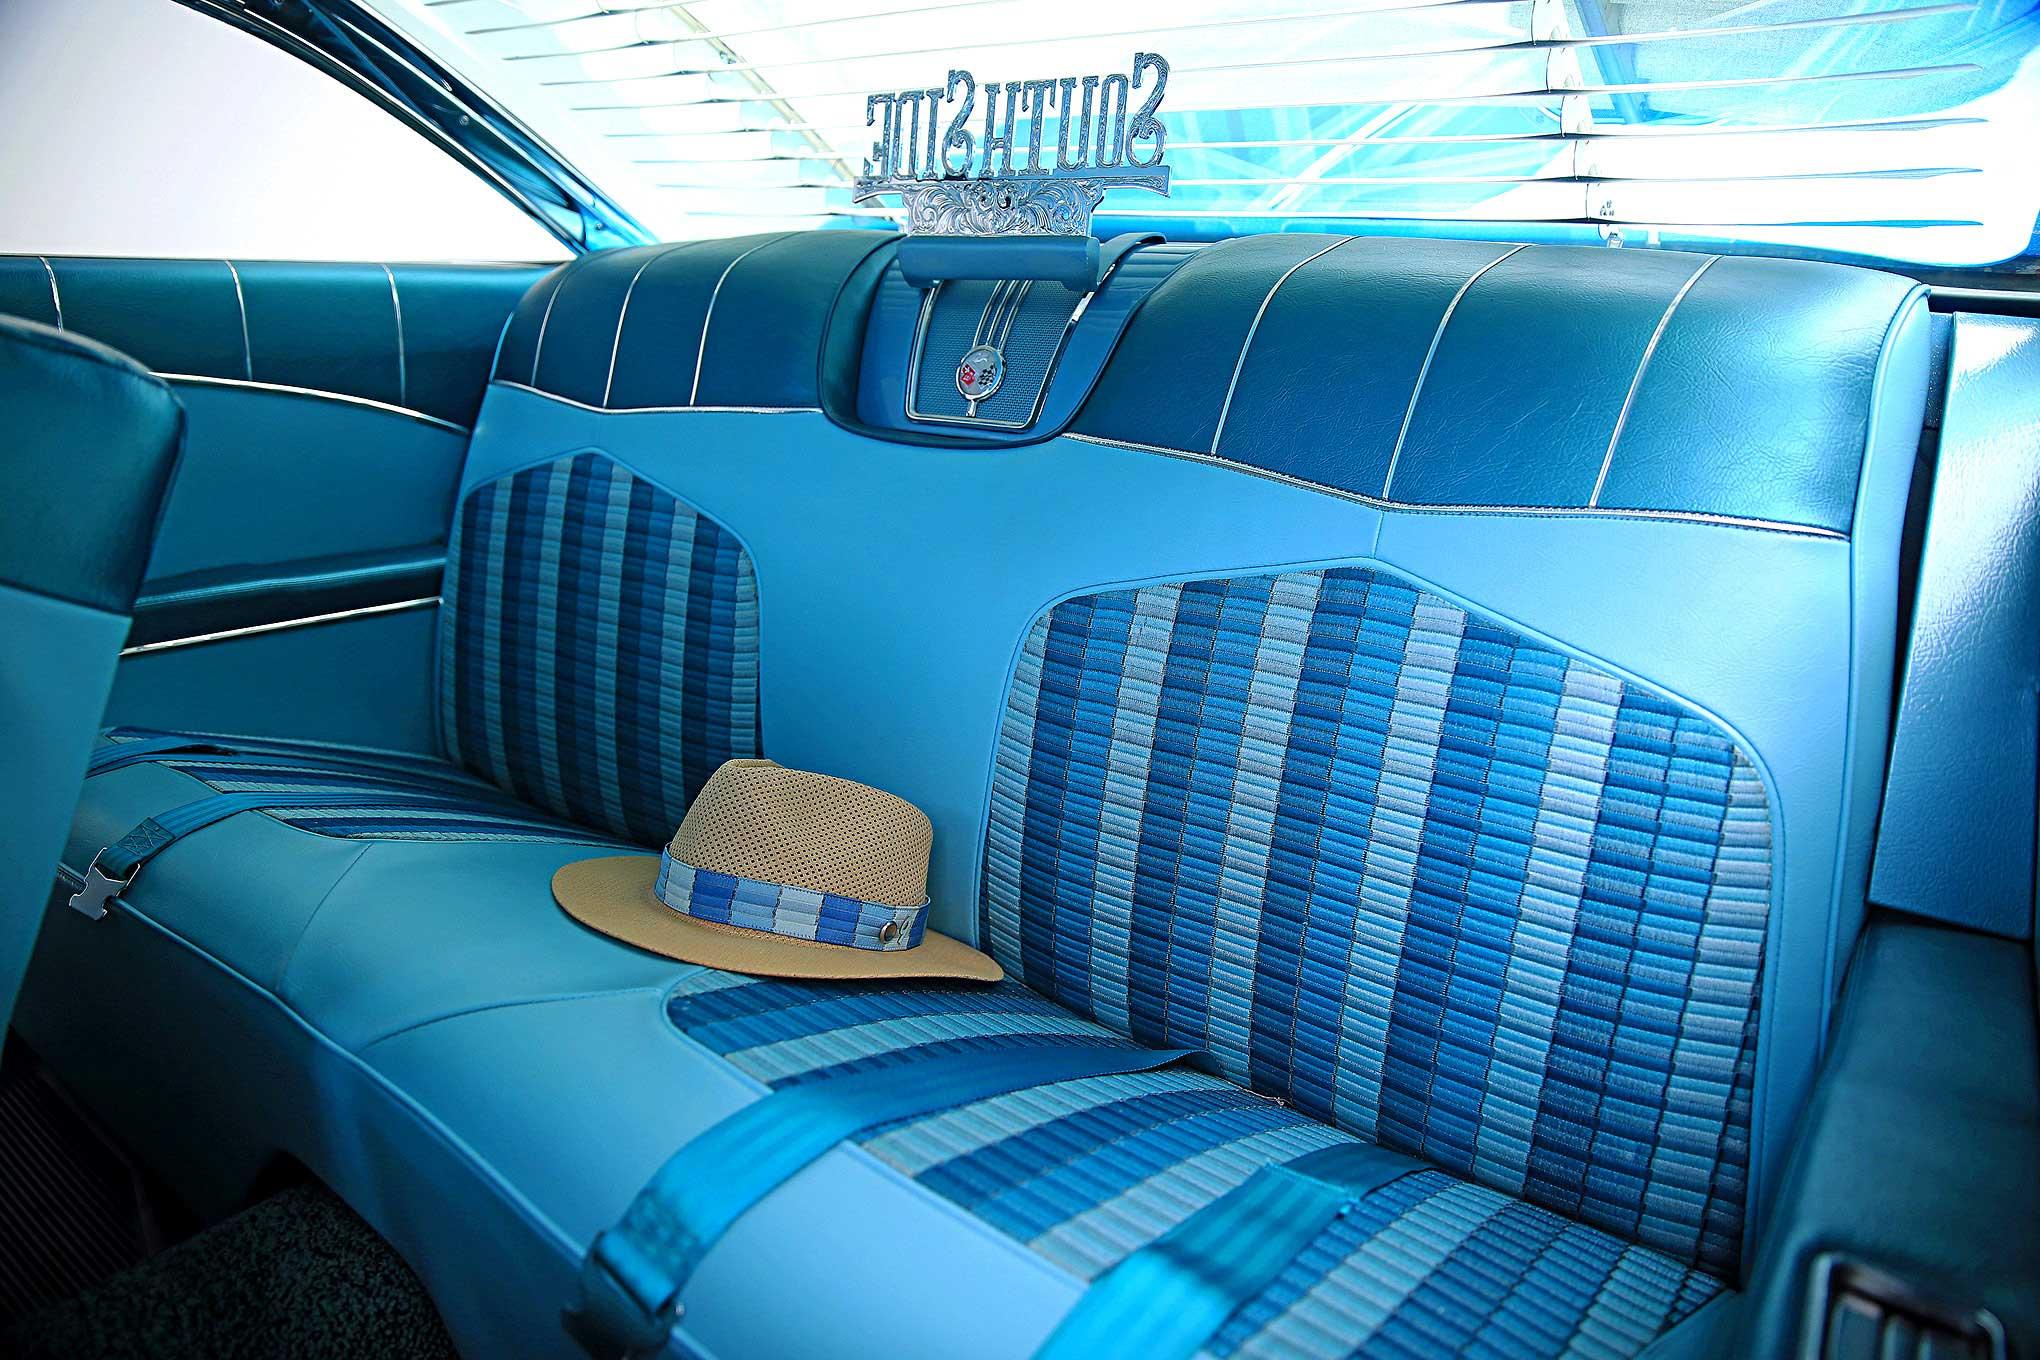 1959 Chevrolet Impala Built In Tijuana Chevy Rear Wiring Harness 3 72